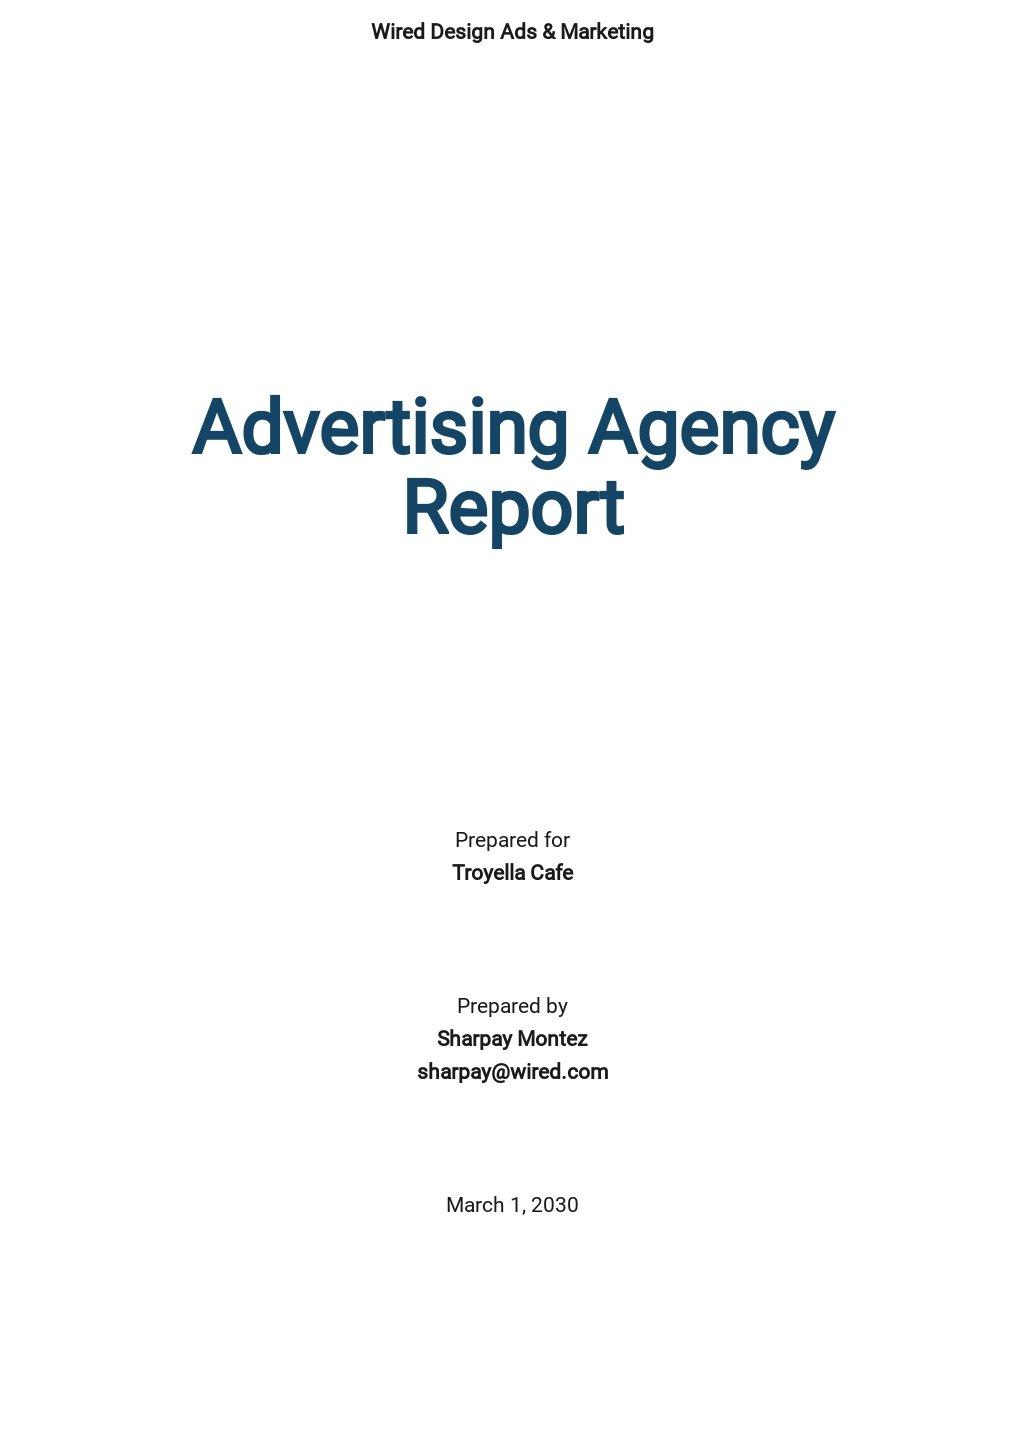 Free Simple Advertising Agency Report Template.jpe